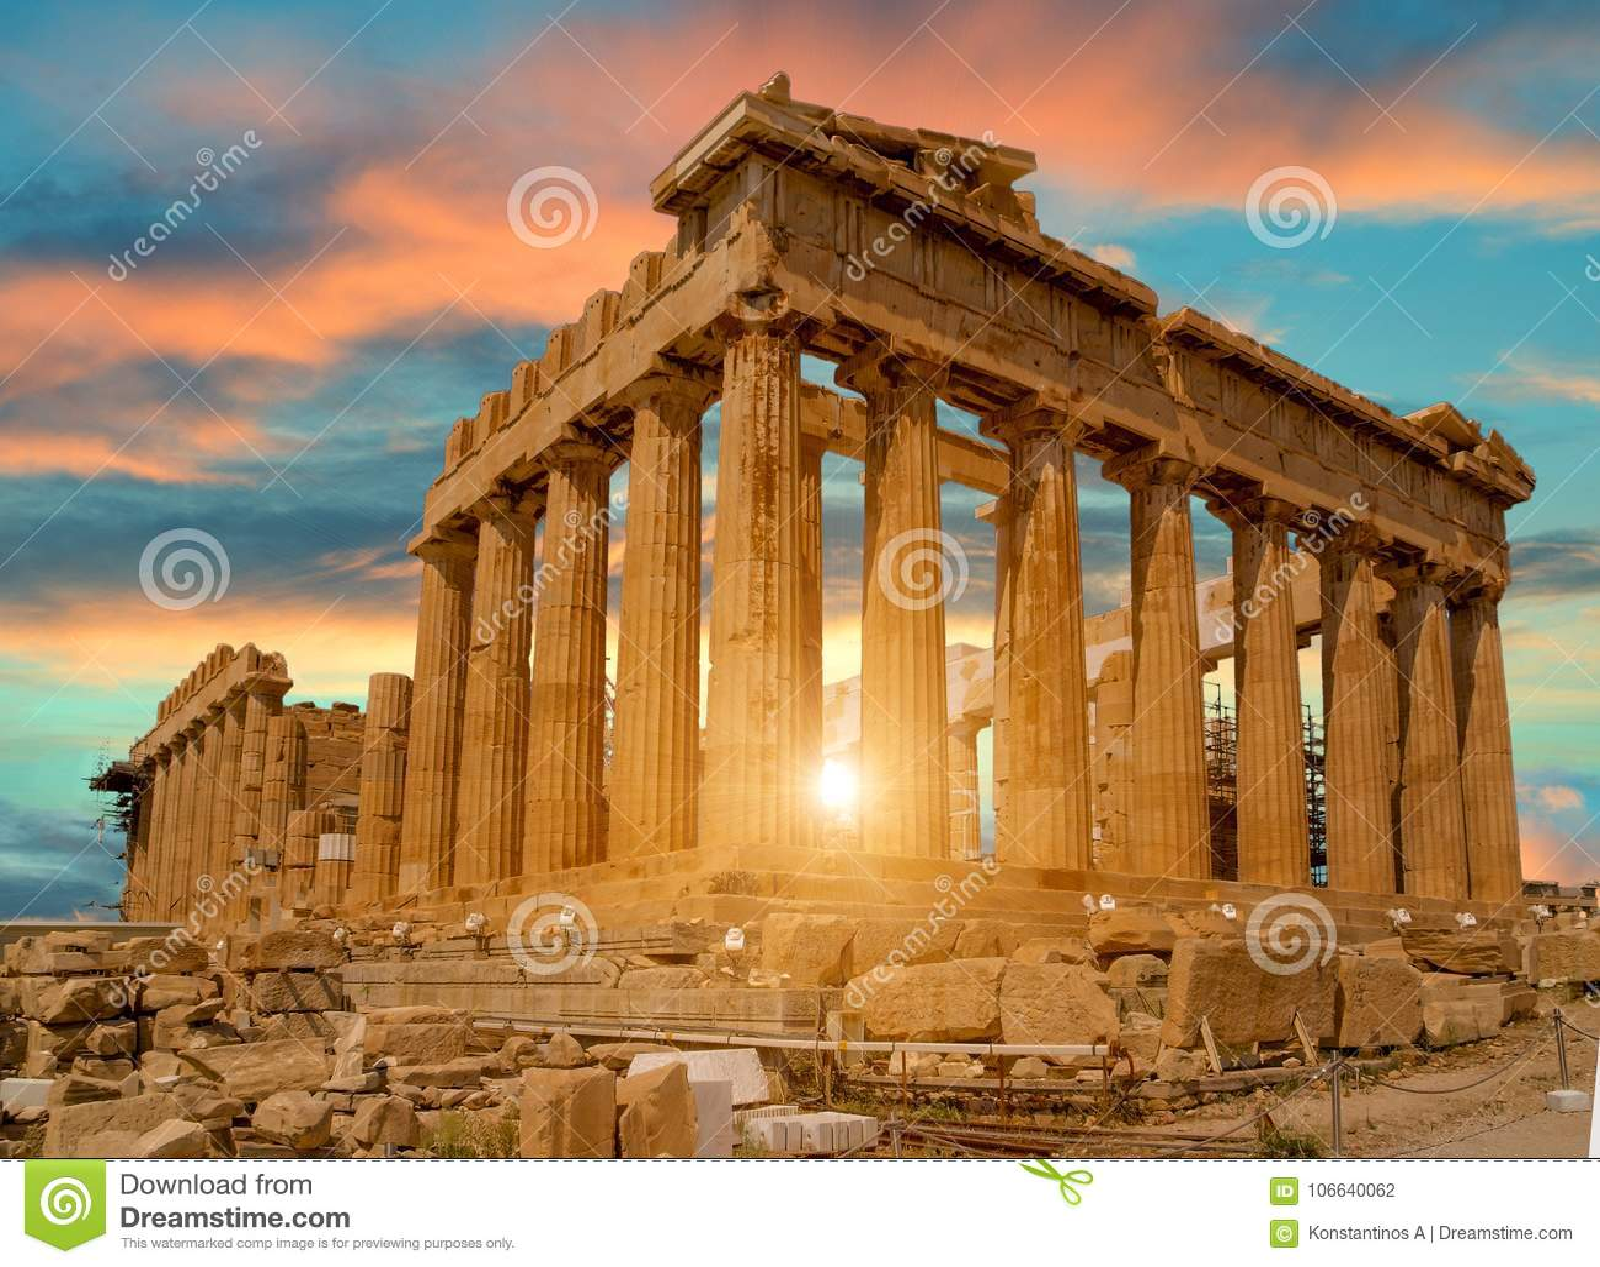 Parthenon athens greece sunset colors